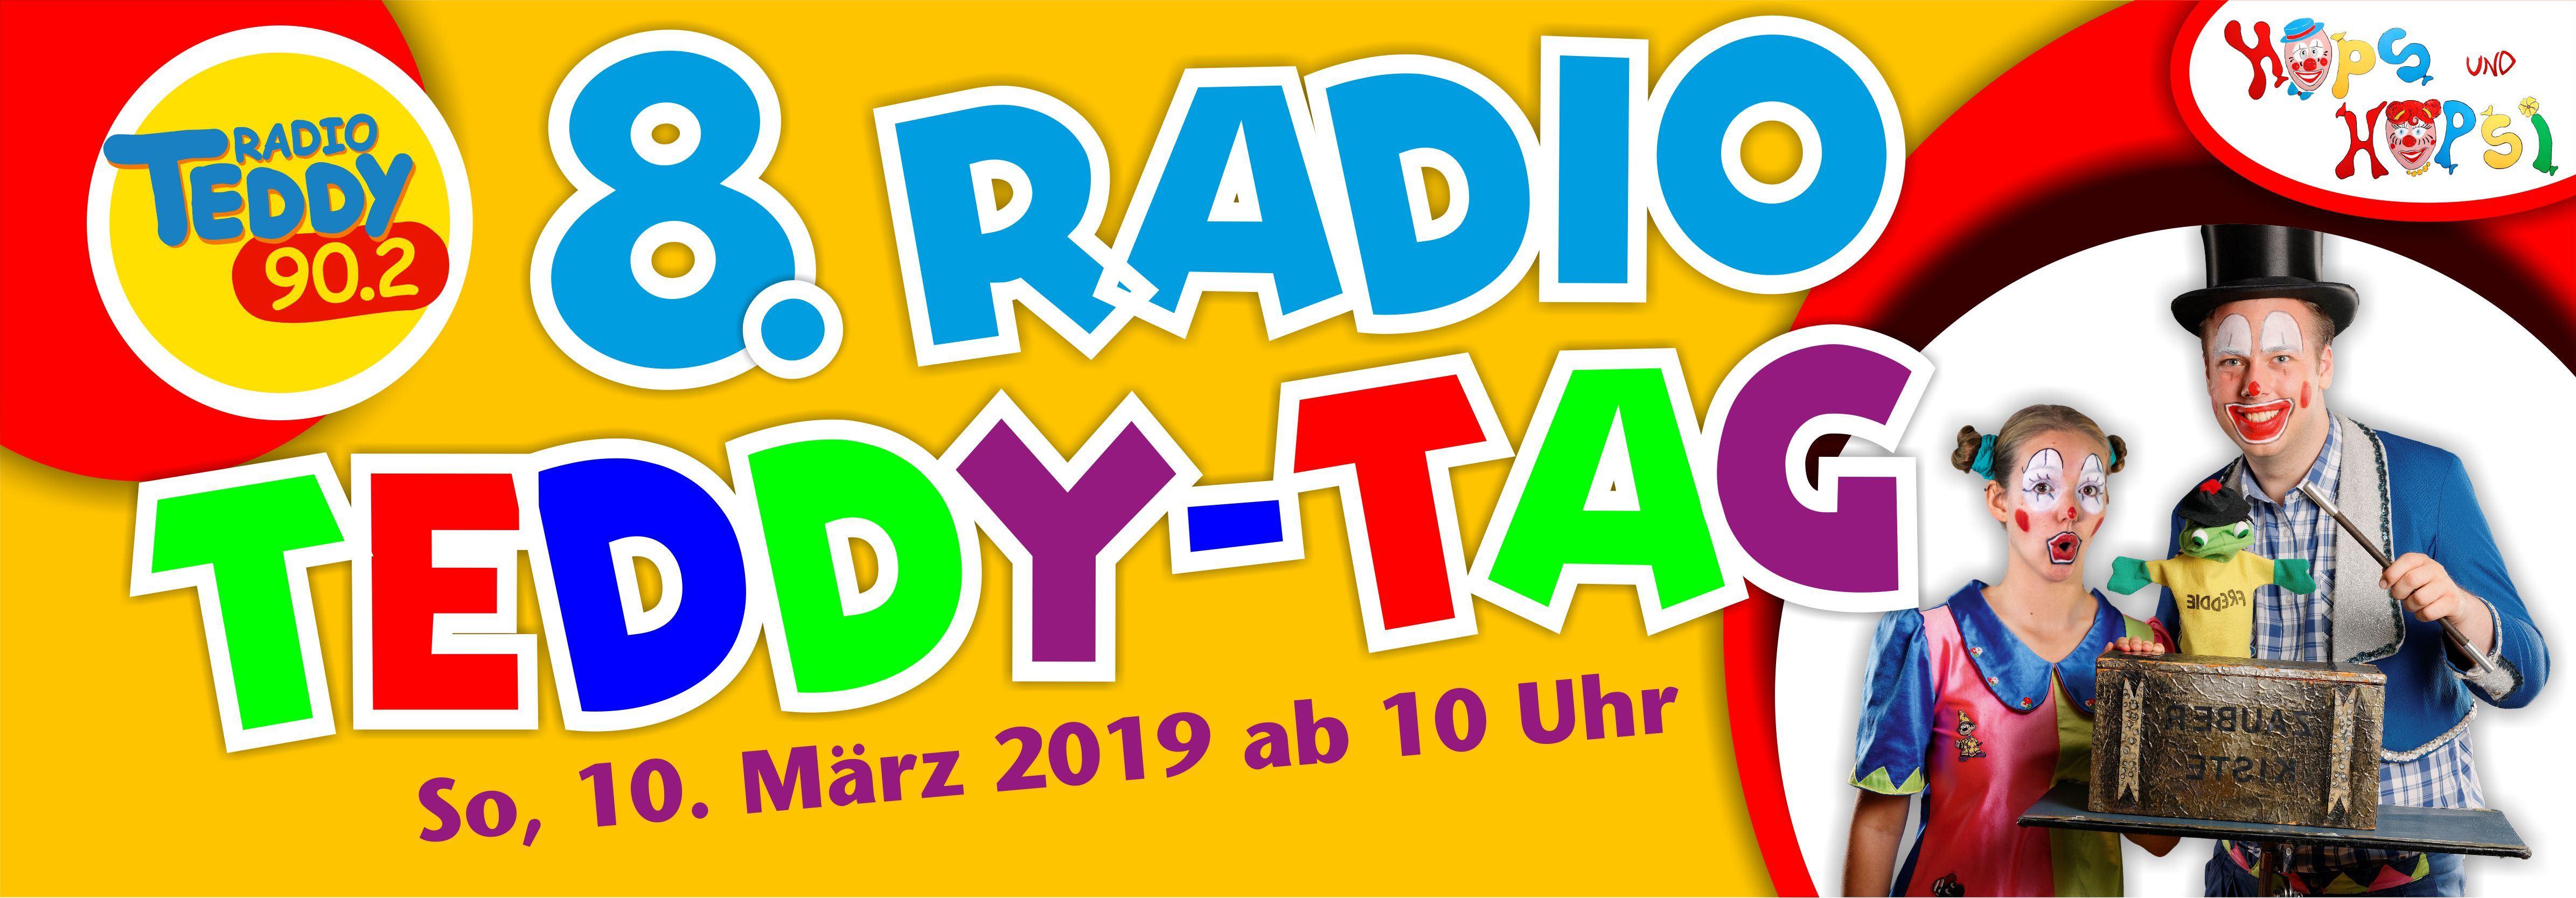 Slider_Radio-Teddy-2019